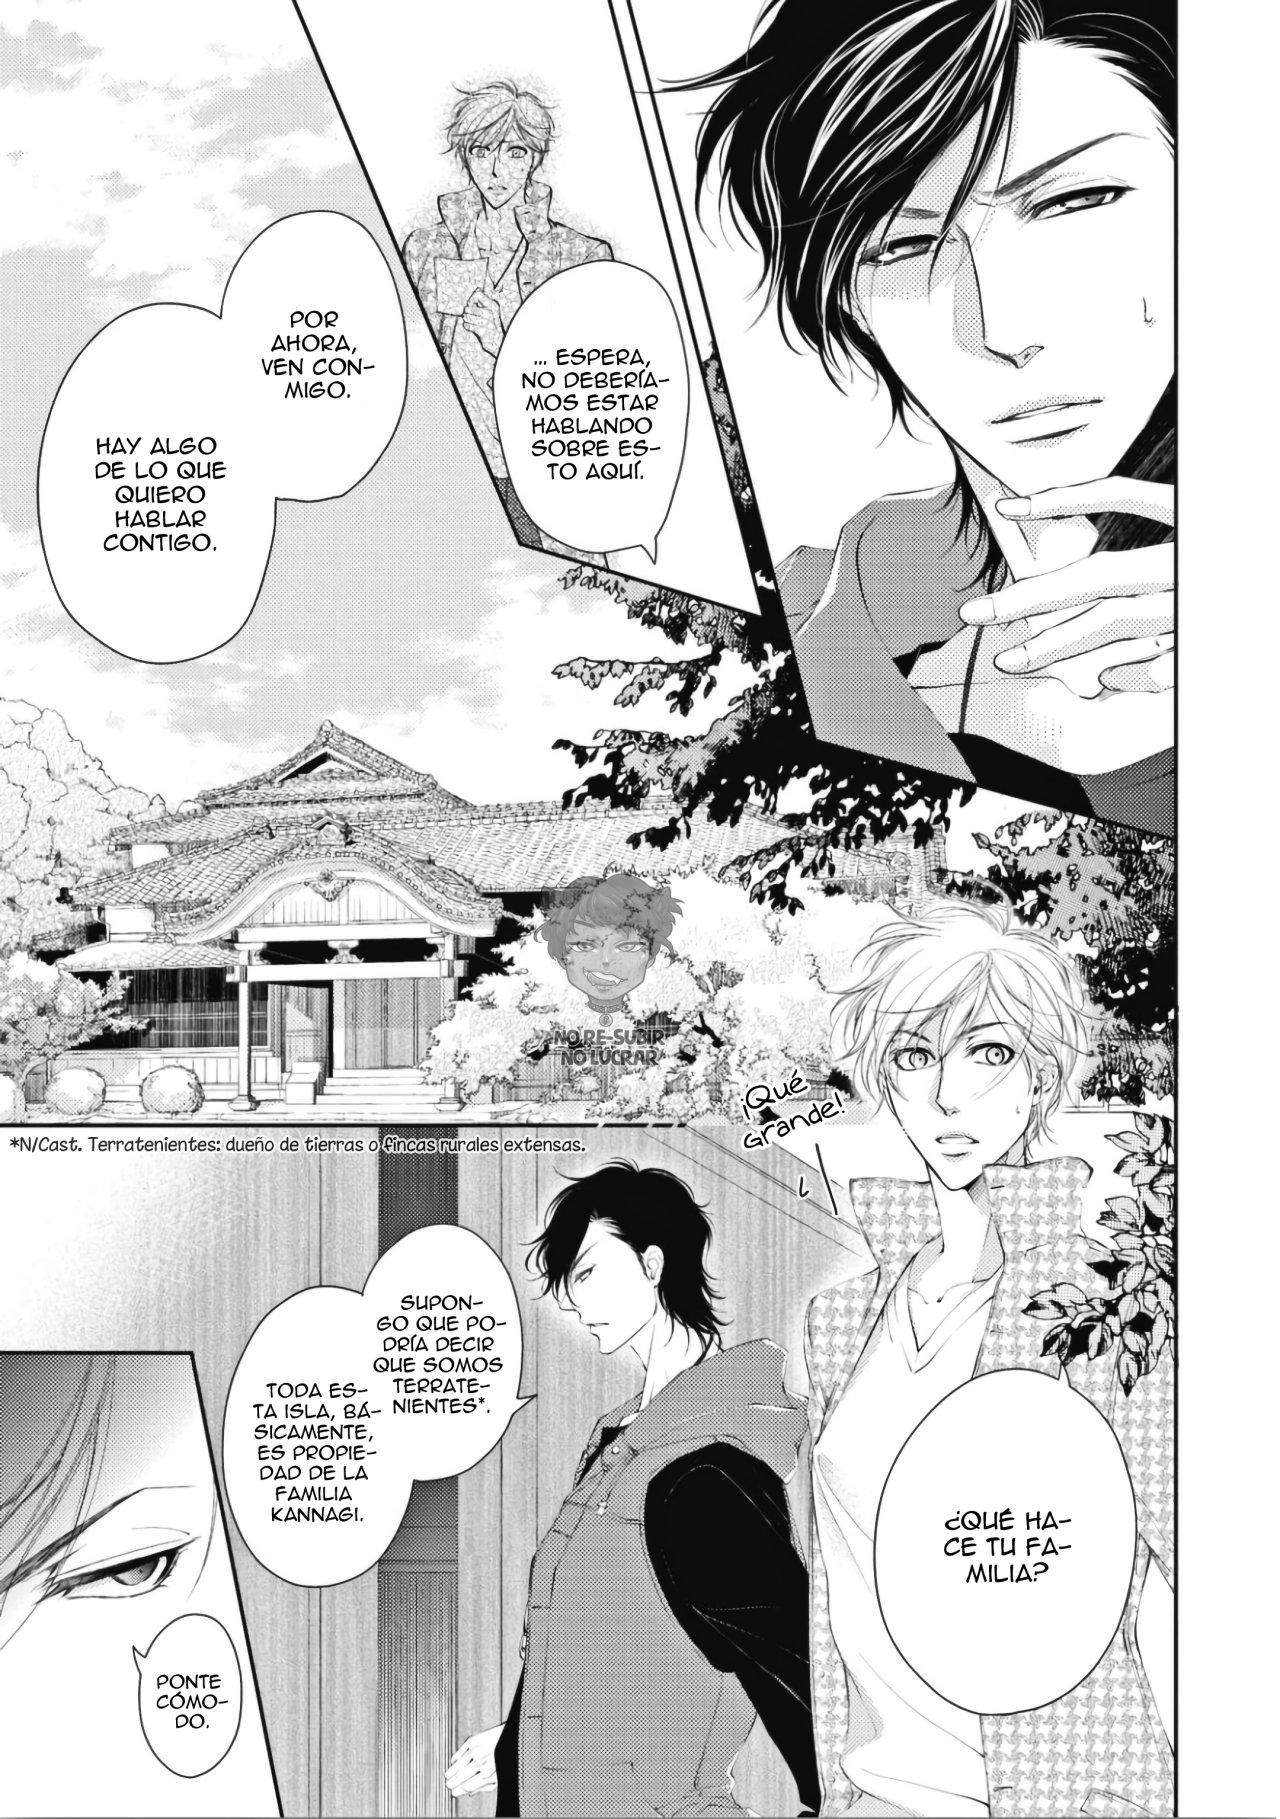 https://nine.mangadogs.com/es_manga/pic8/51/36659/946321/db3d20709cb13931e9c88a699e83fd1f.jpg Page 32